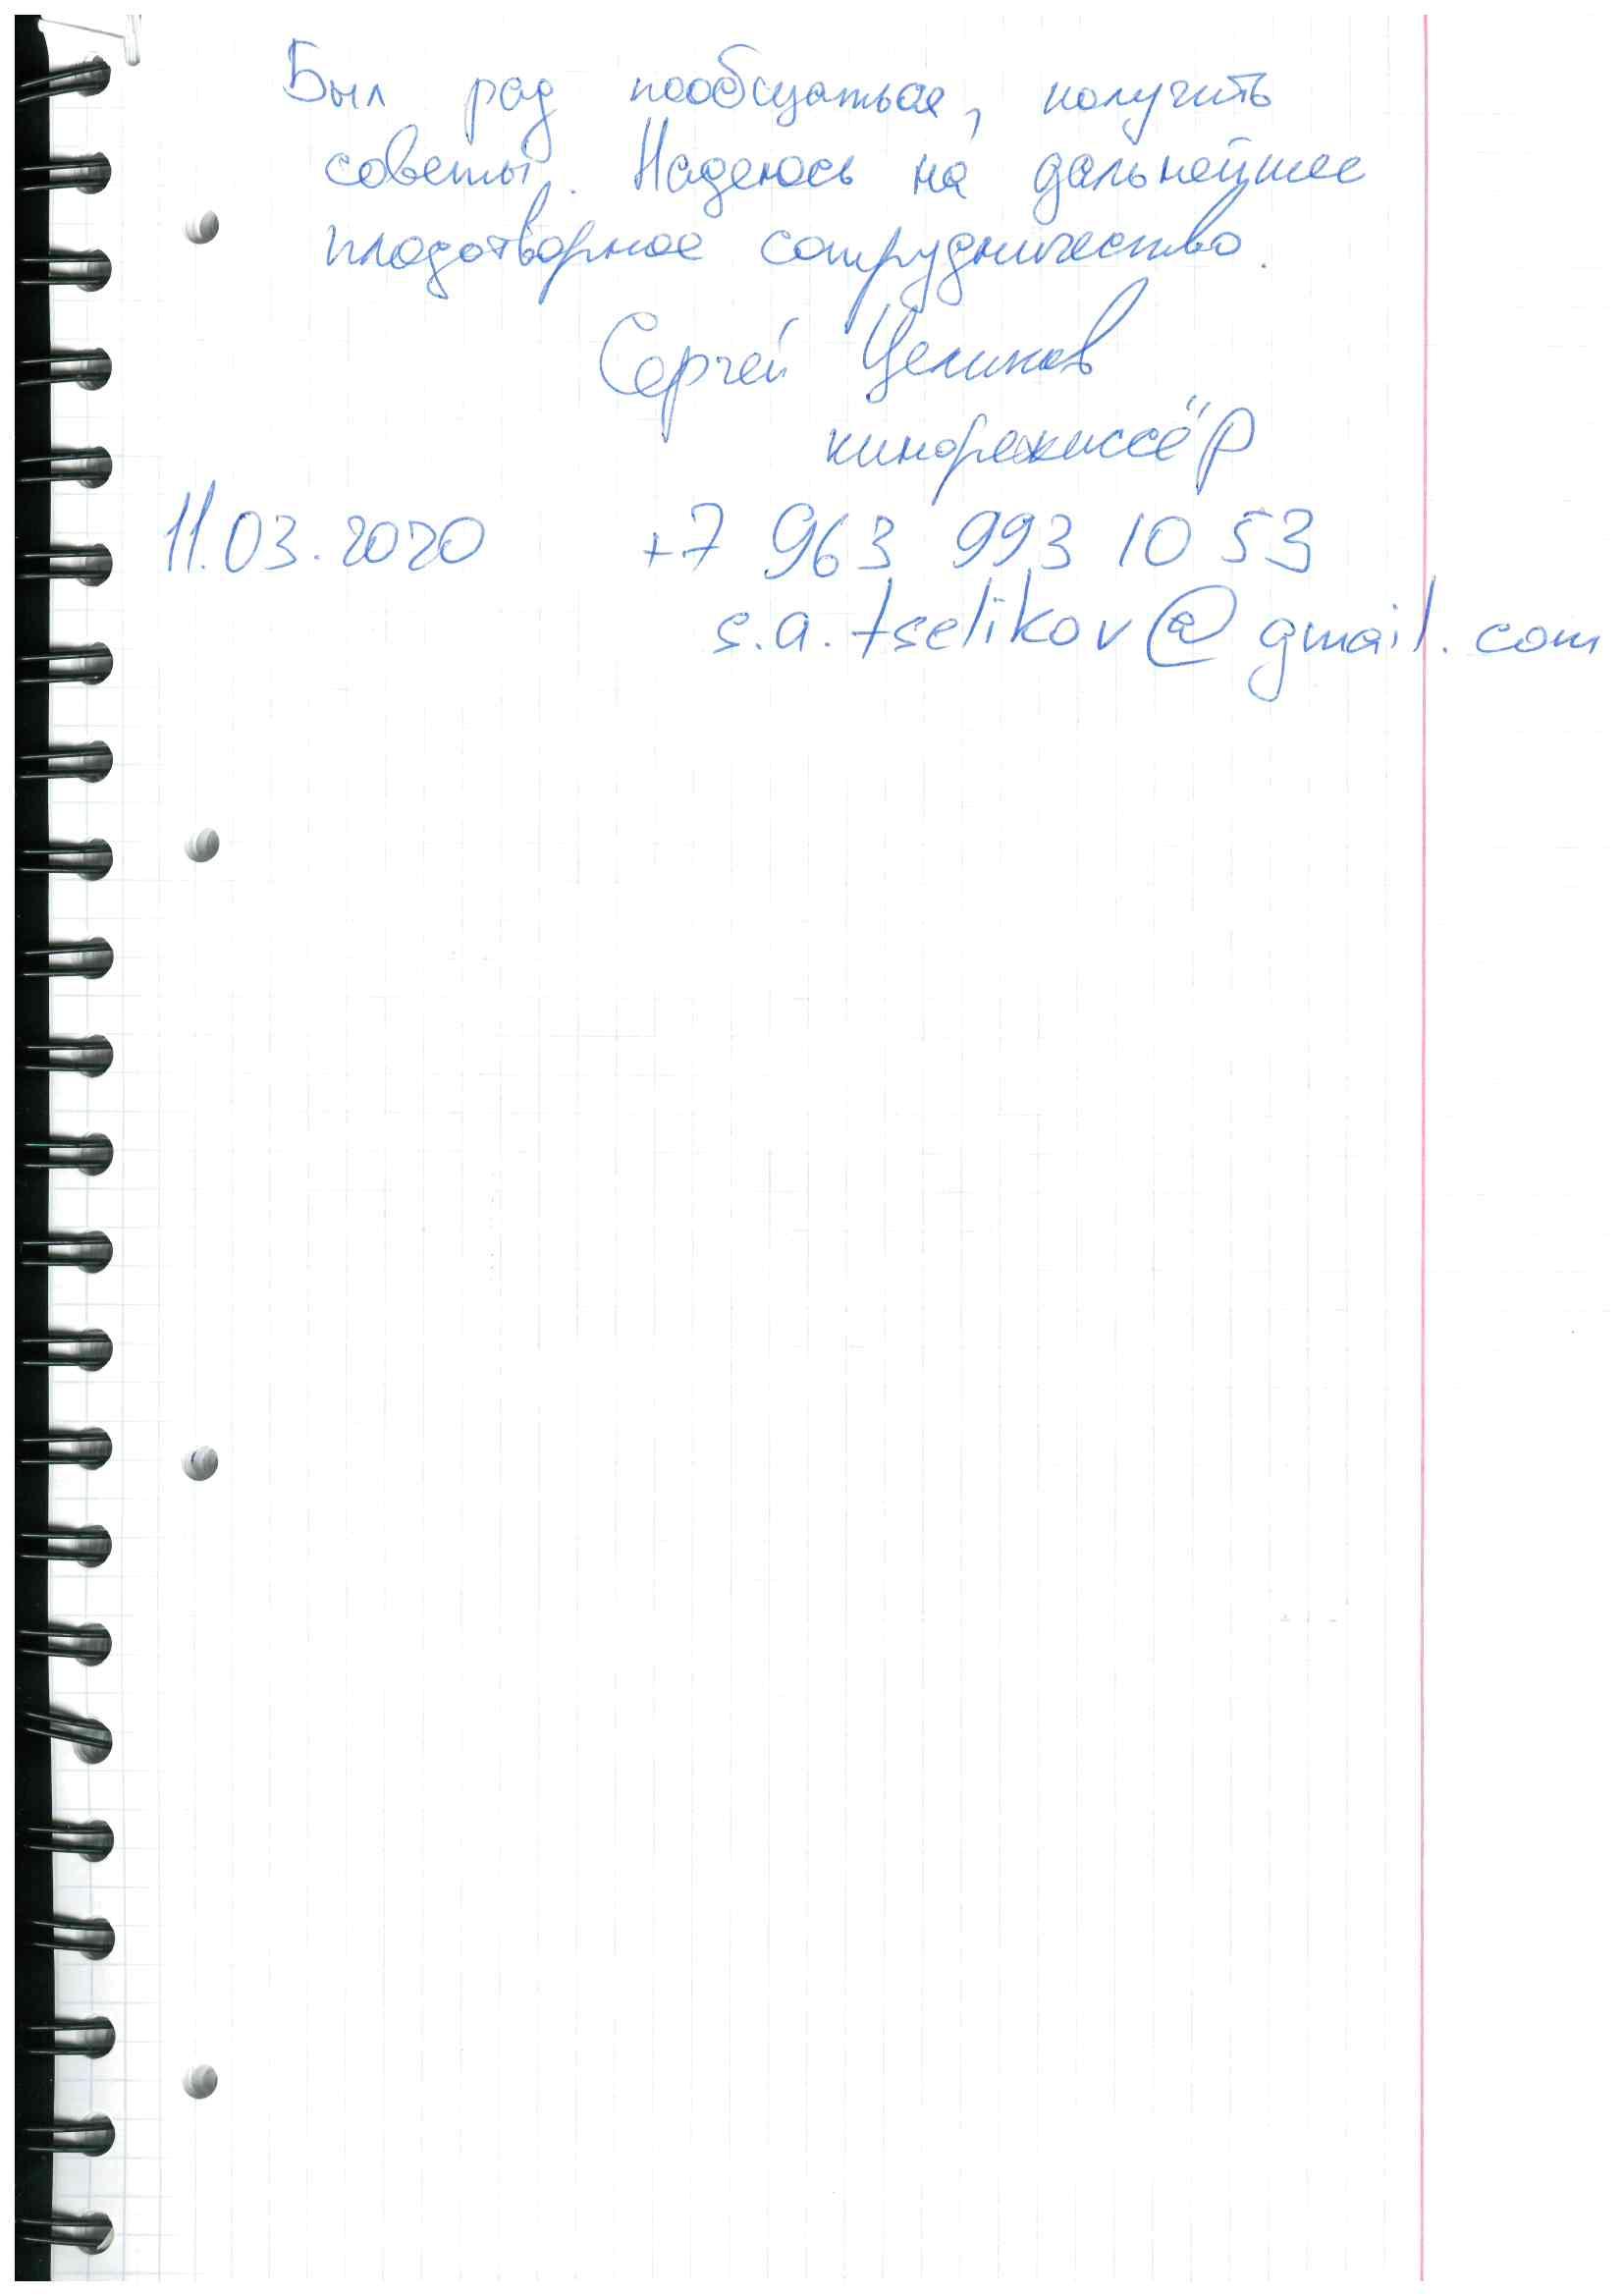 11.03.2021_7